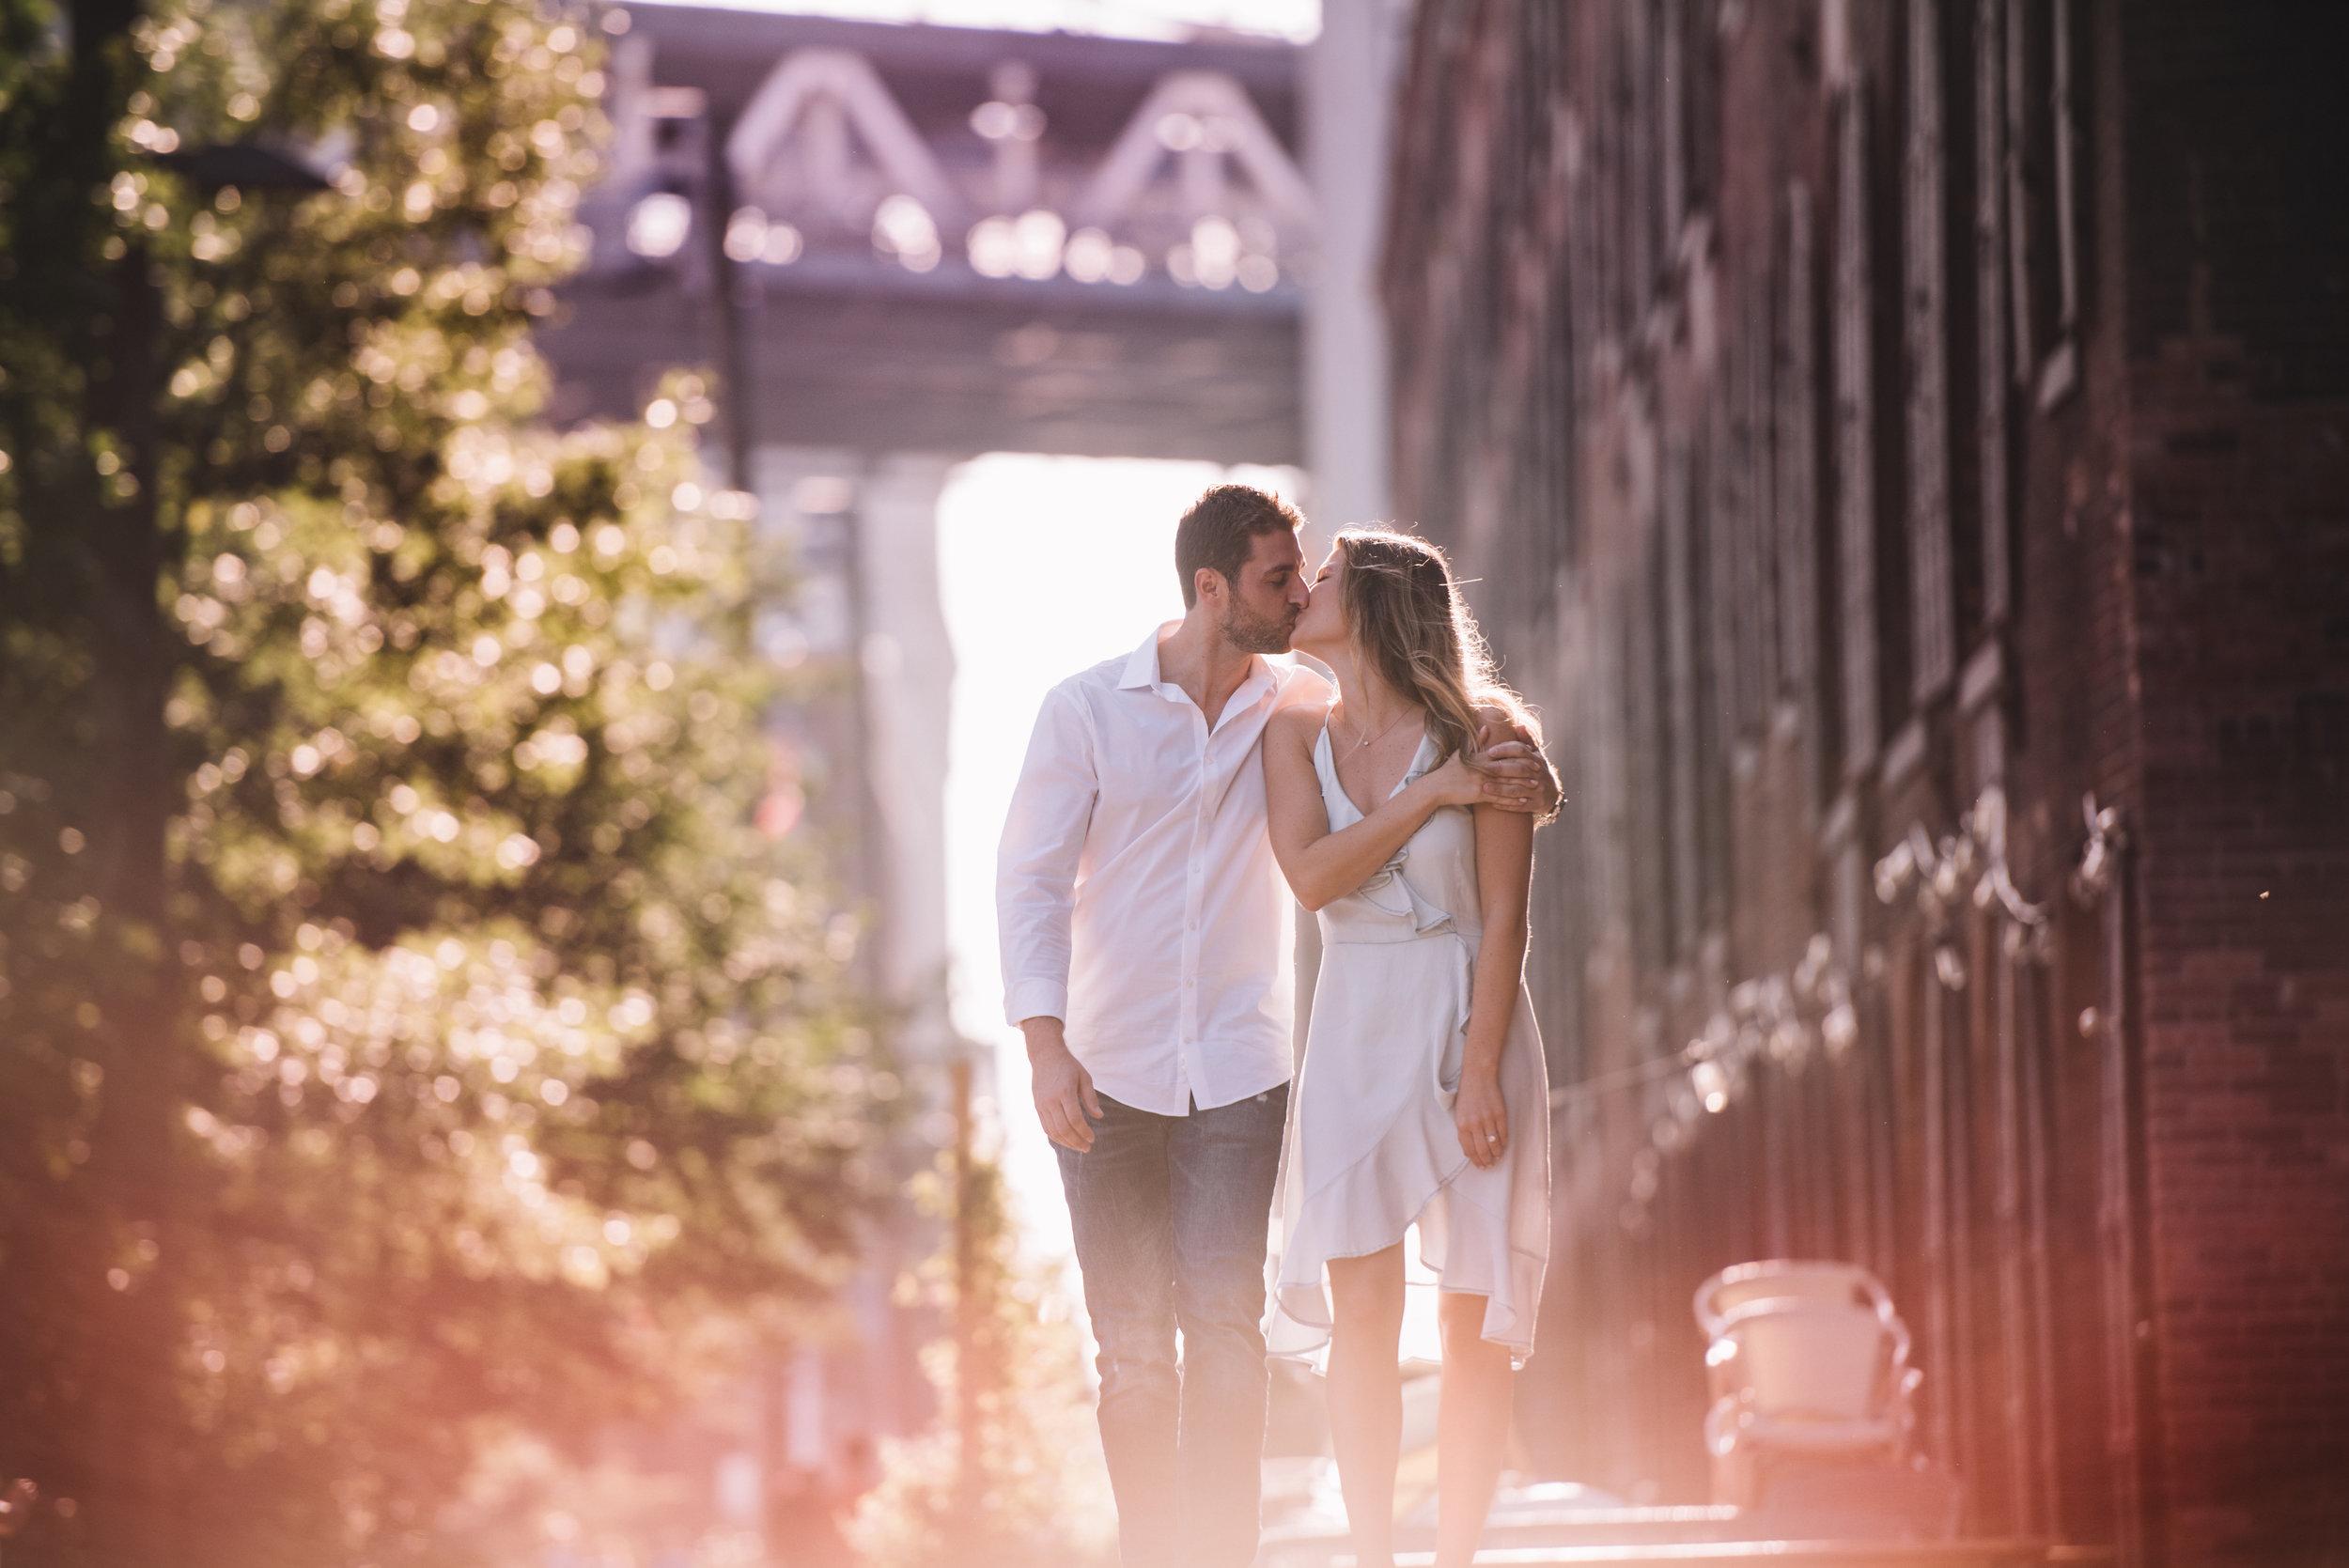 WeddingPhotos | NJPhotographer | Highlights-3-30.jpg